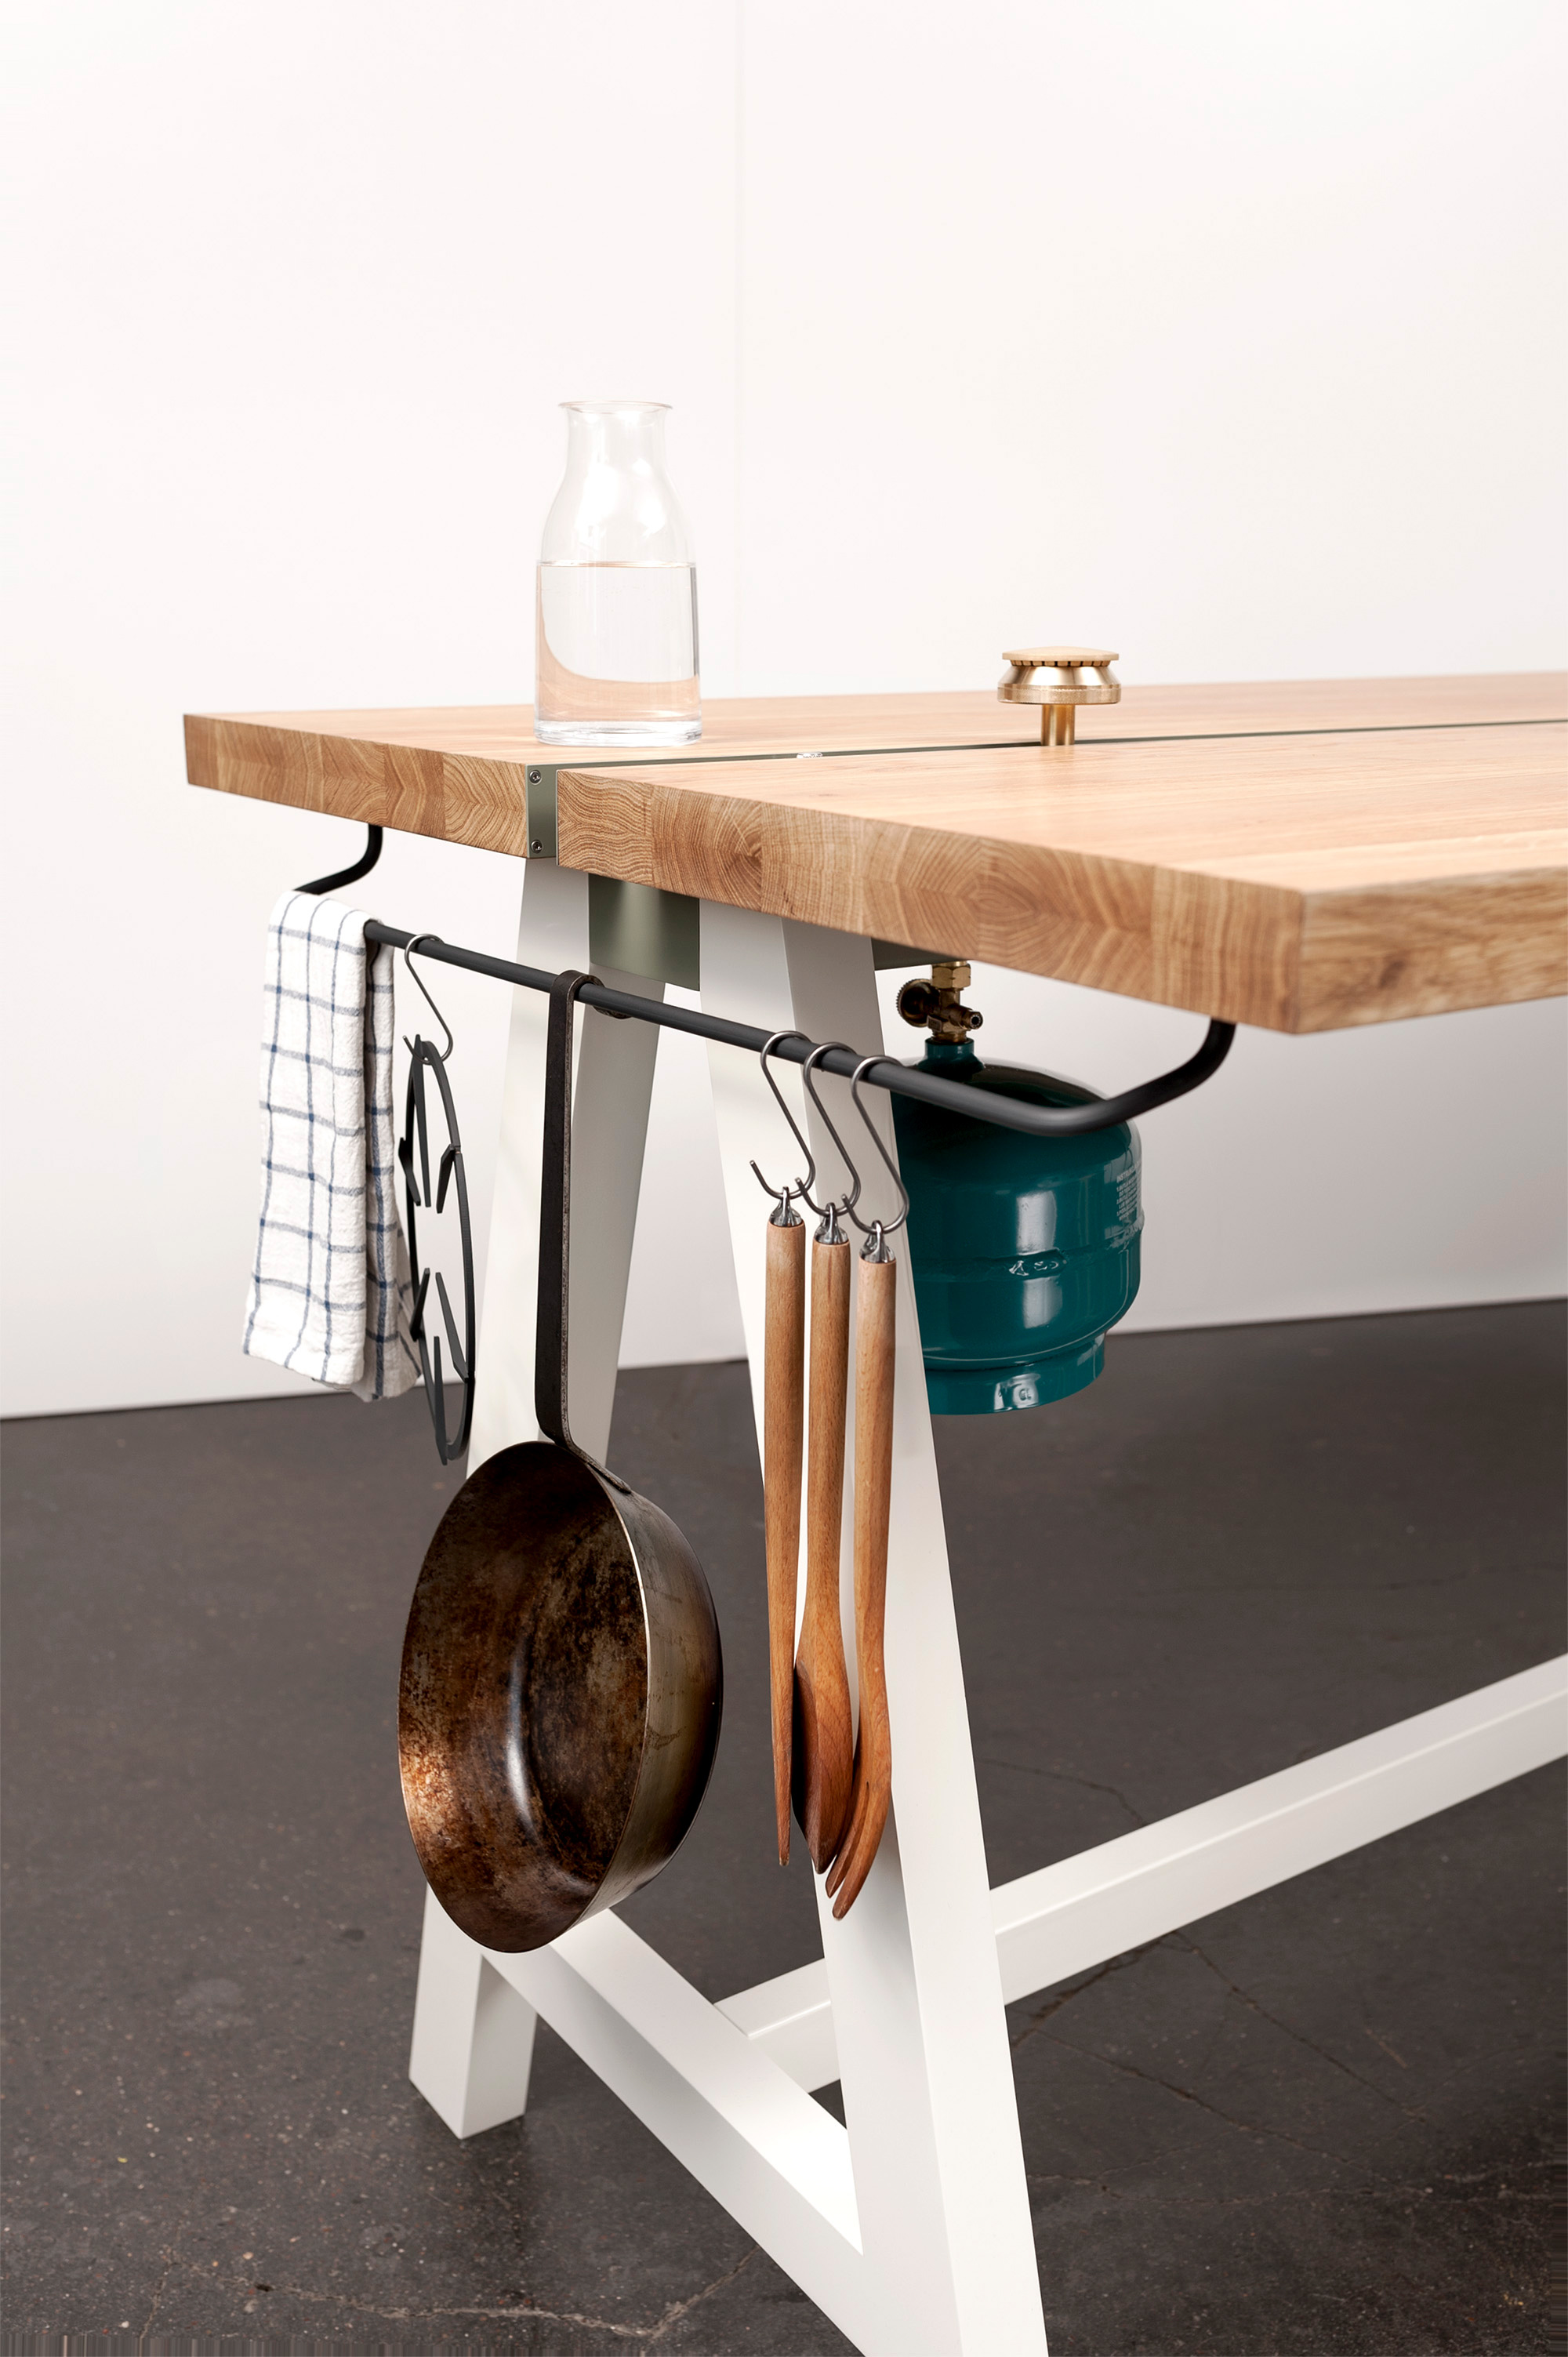 Studio-MoritzPutzier_The-Cooking-Table-11.jpg